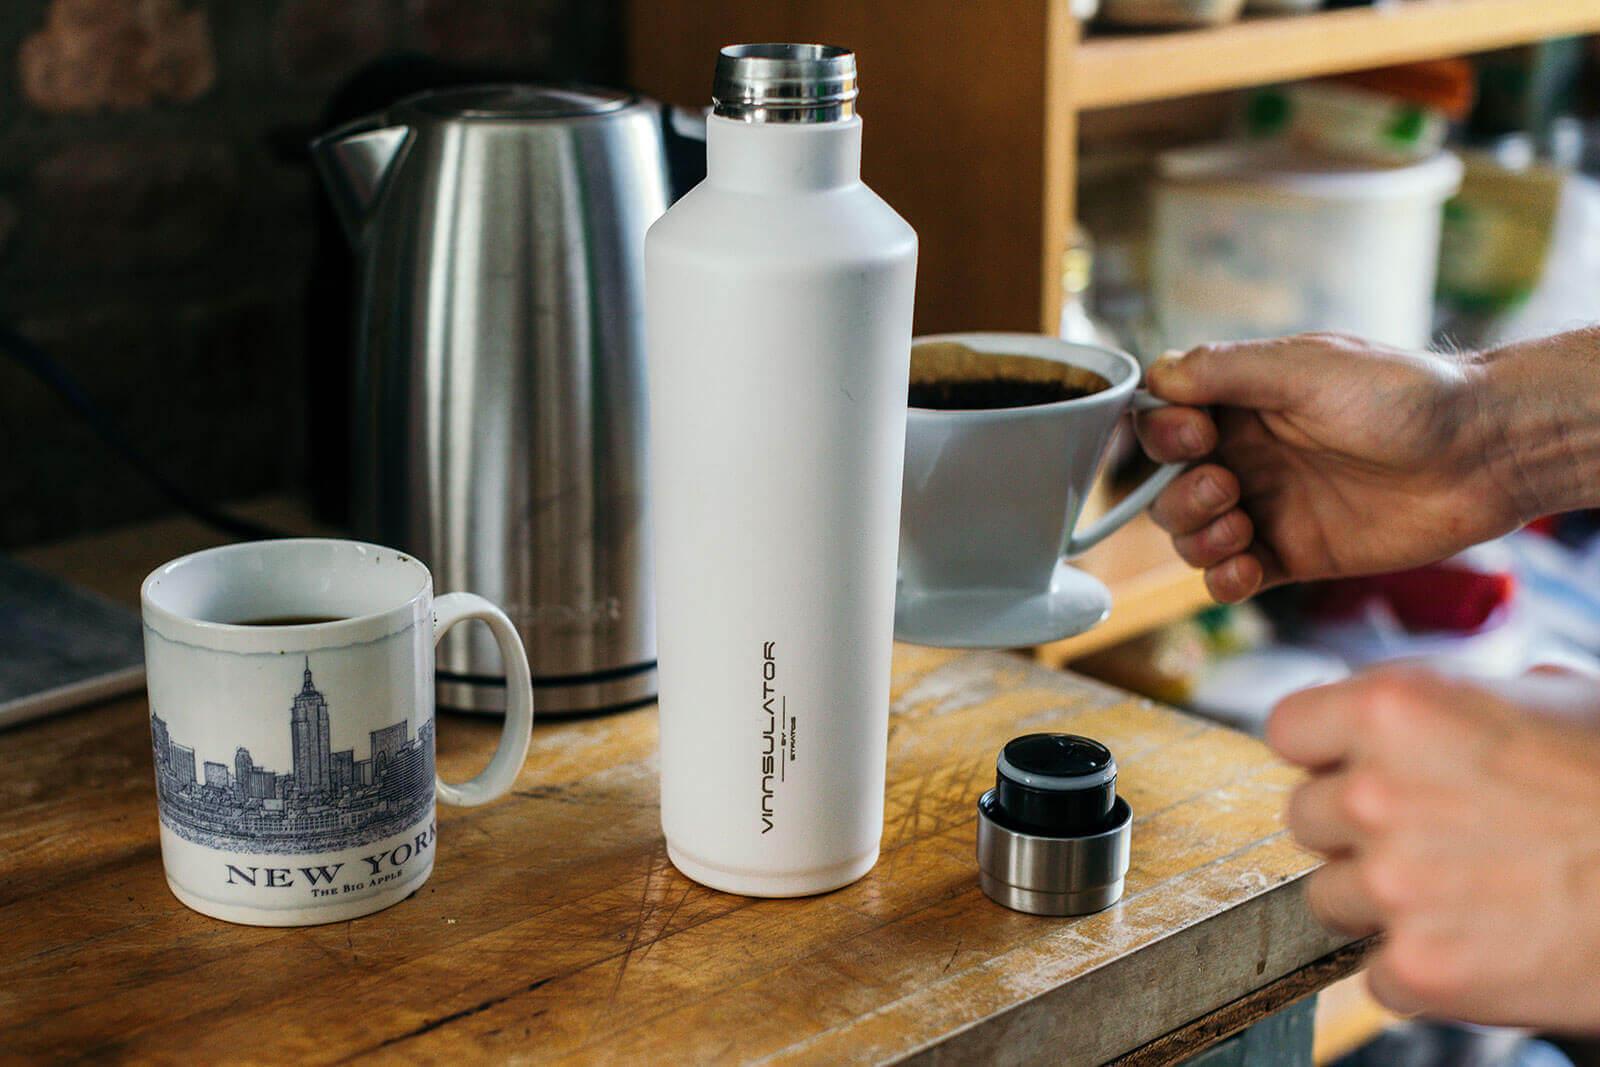 Using hot liquids in a Vinnsulator water bottle